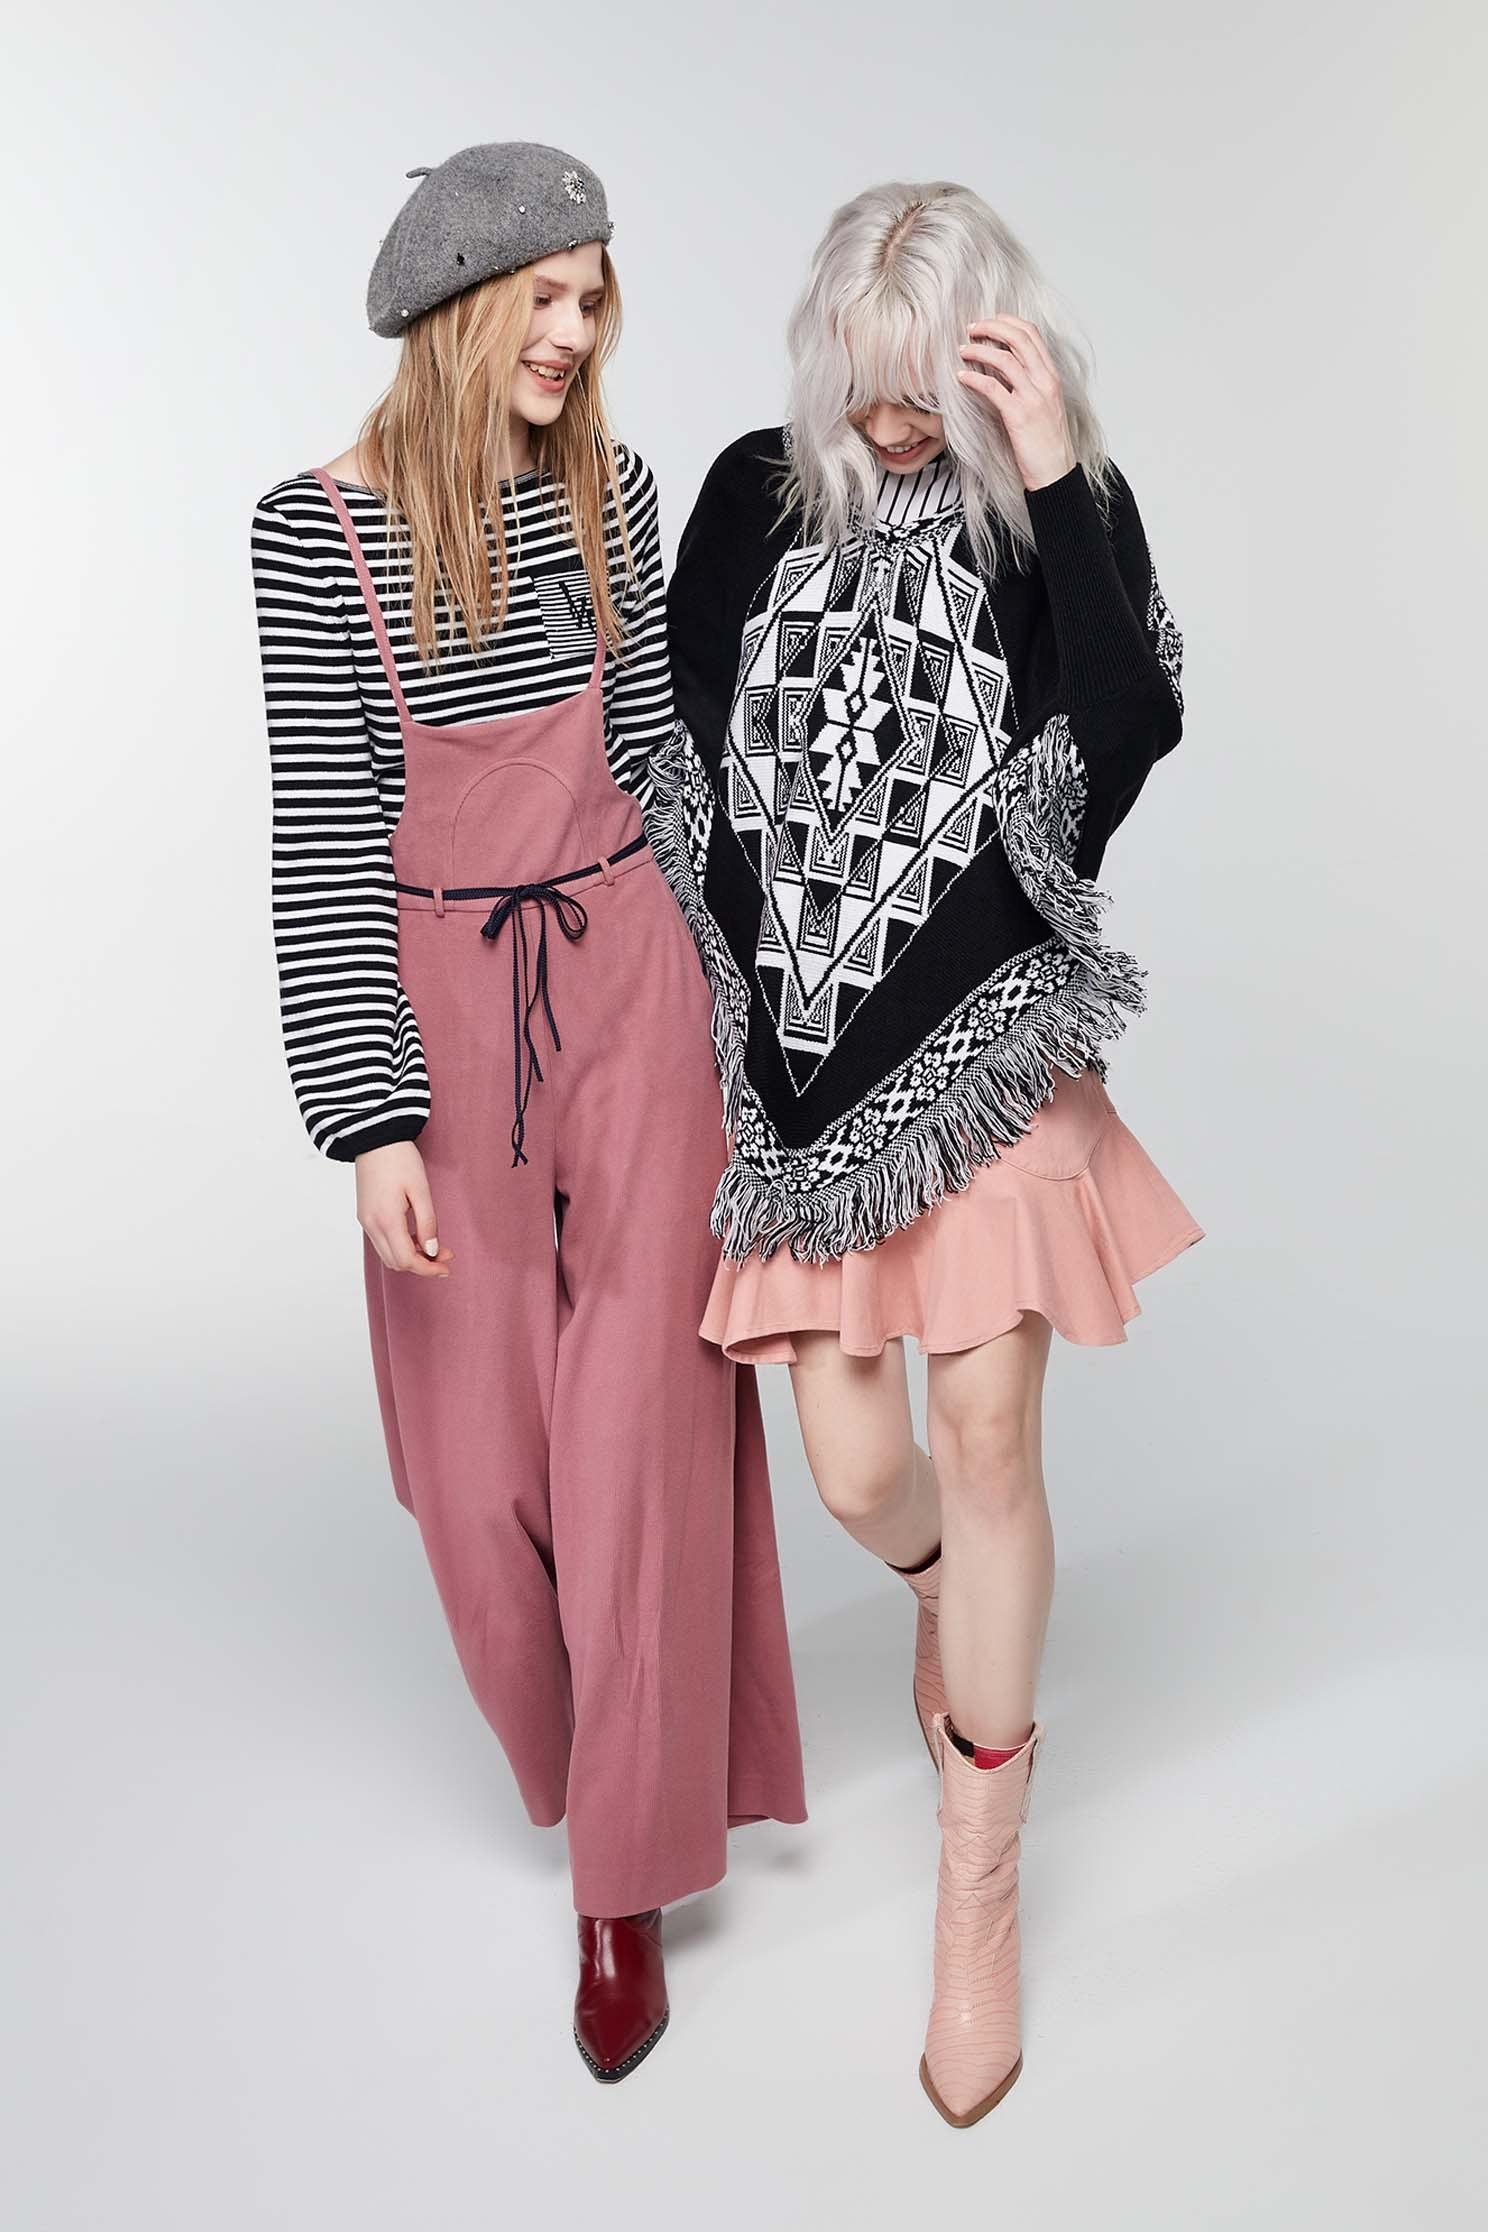 Black/white thin stripes knitting top,top,knitting,knittedtop,knittedtop,longsleevetop